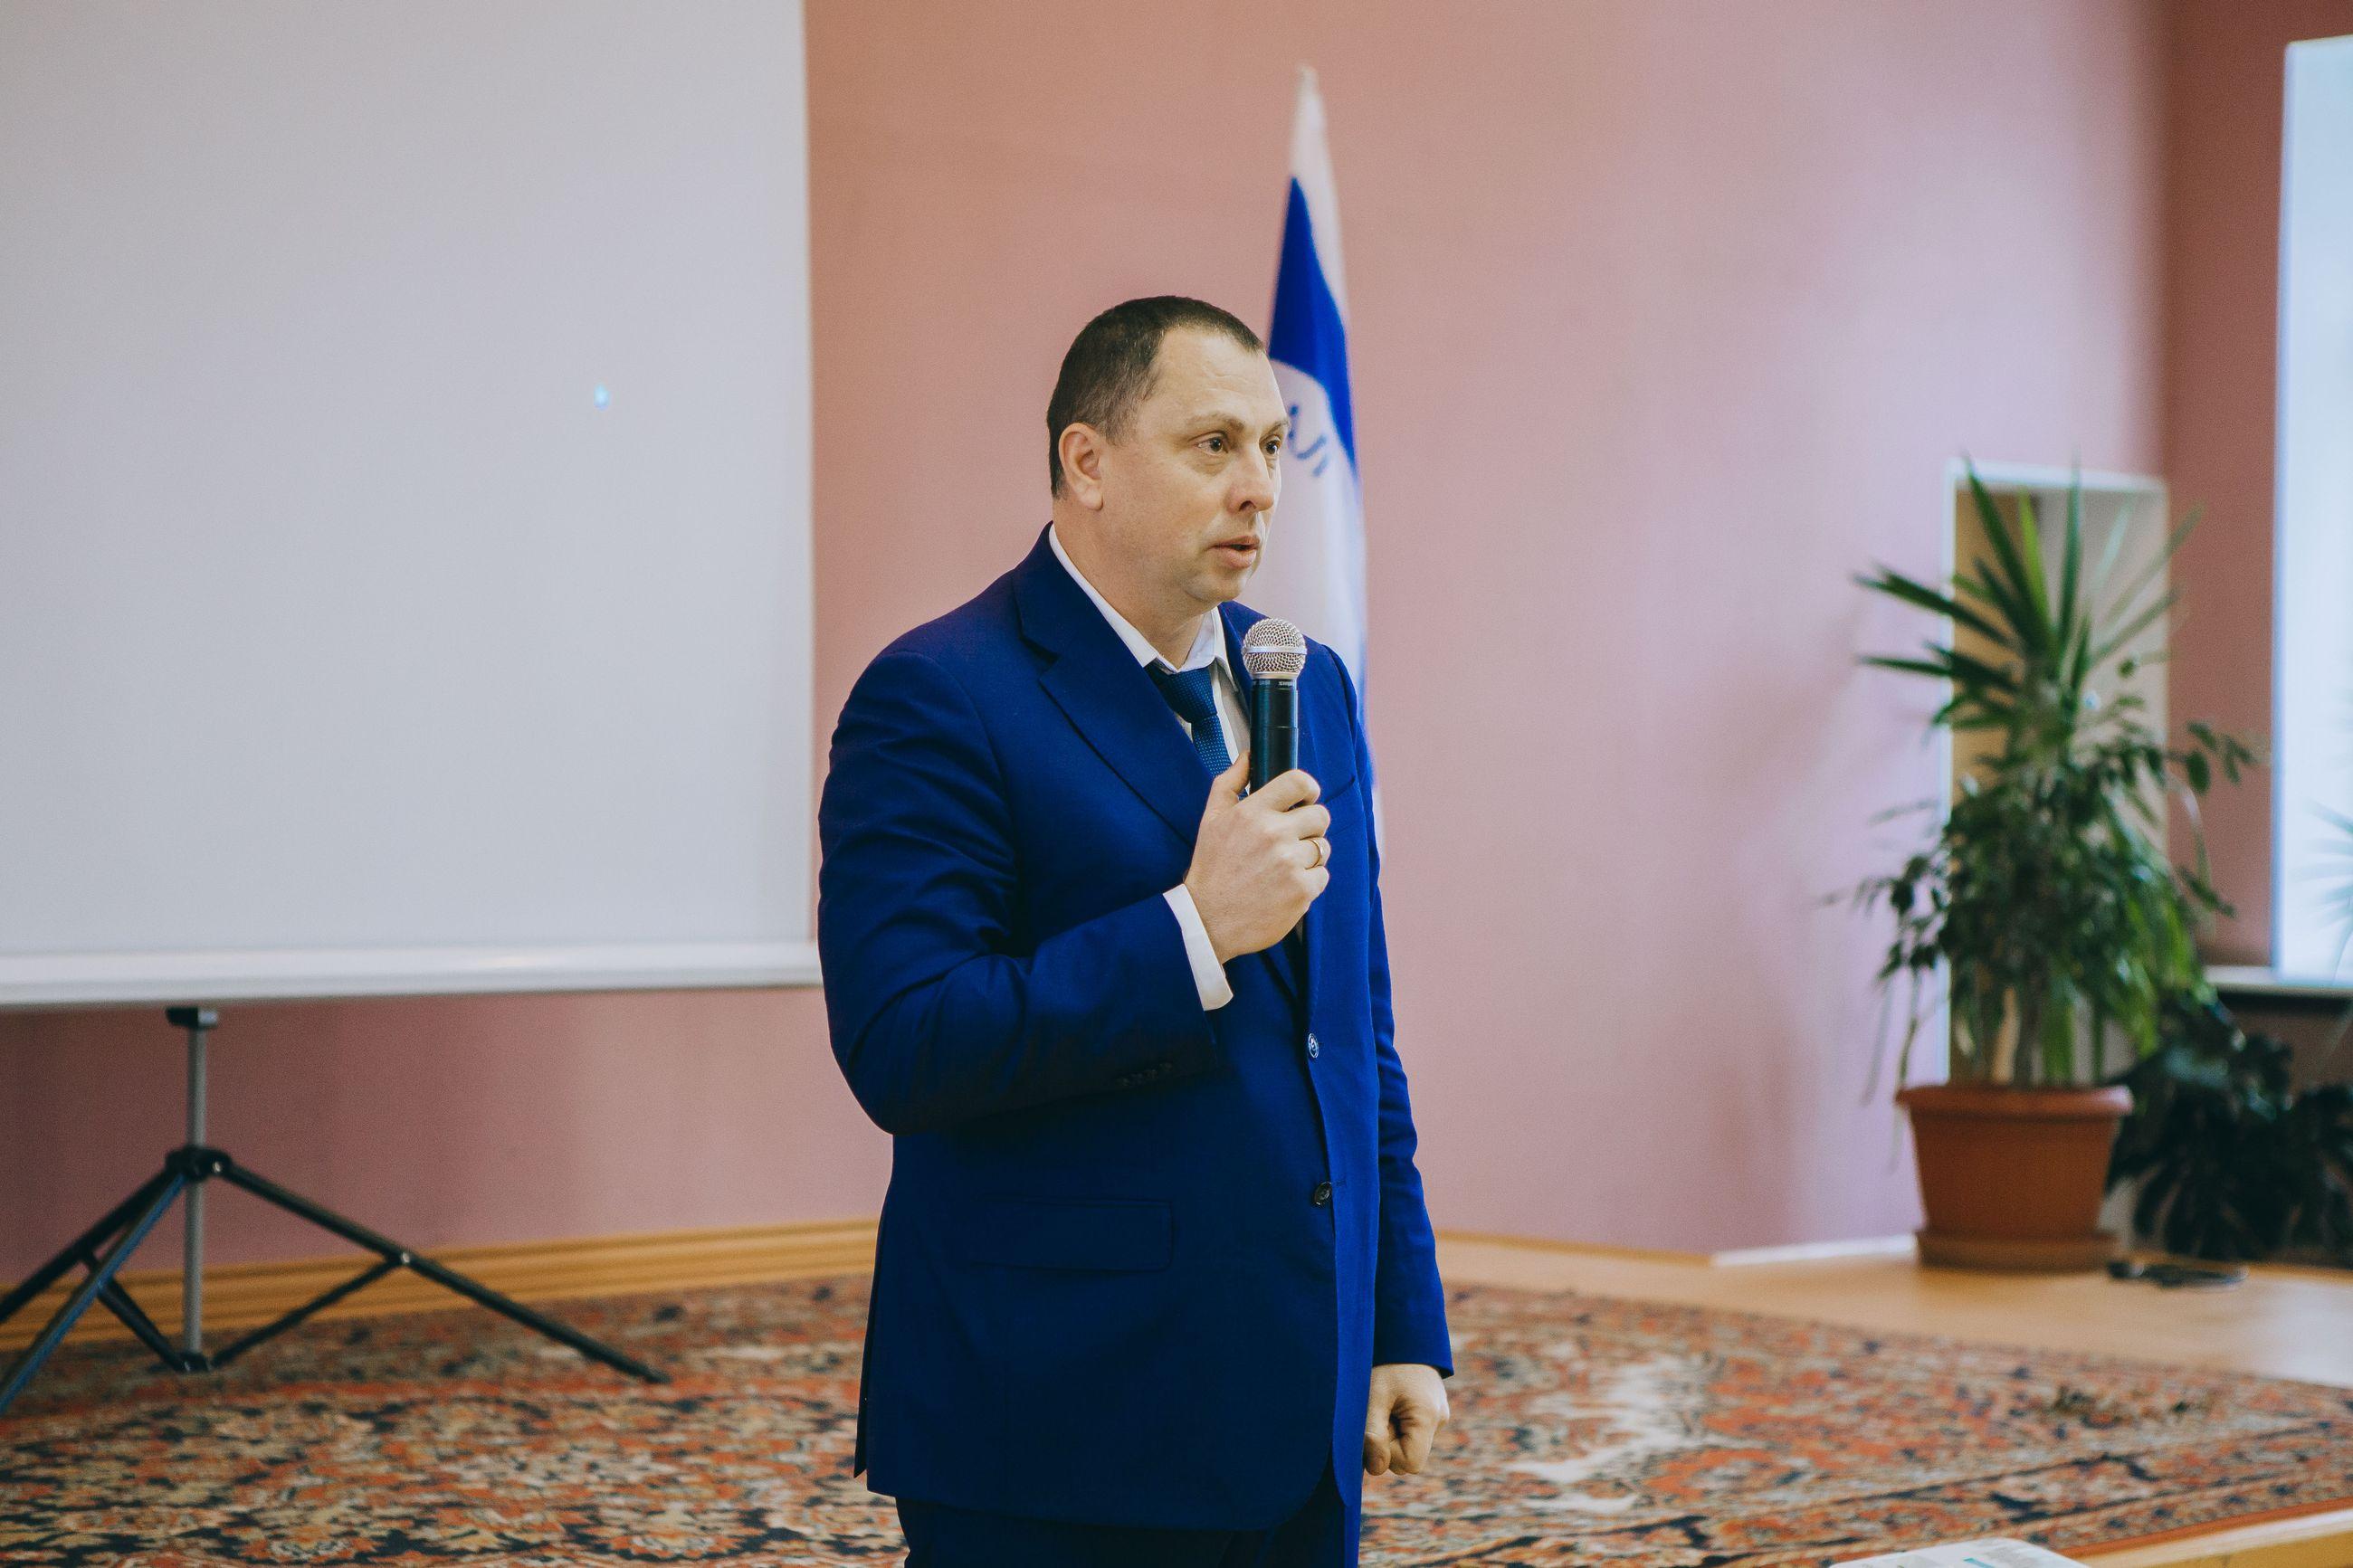 Катаев Владислав Васильевич